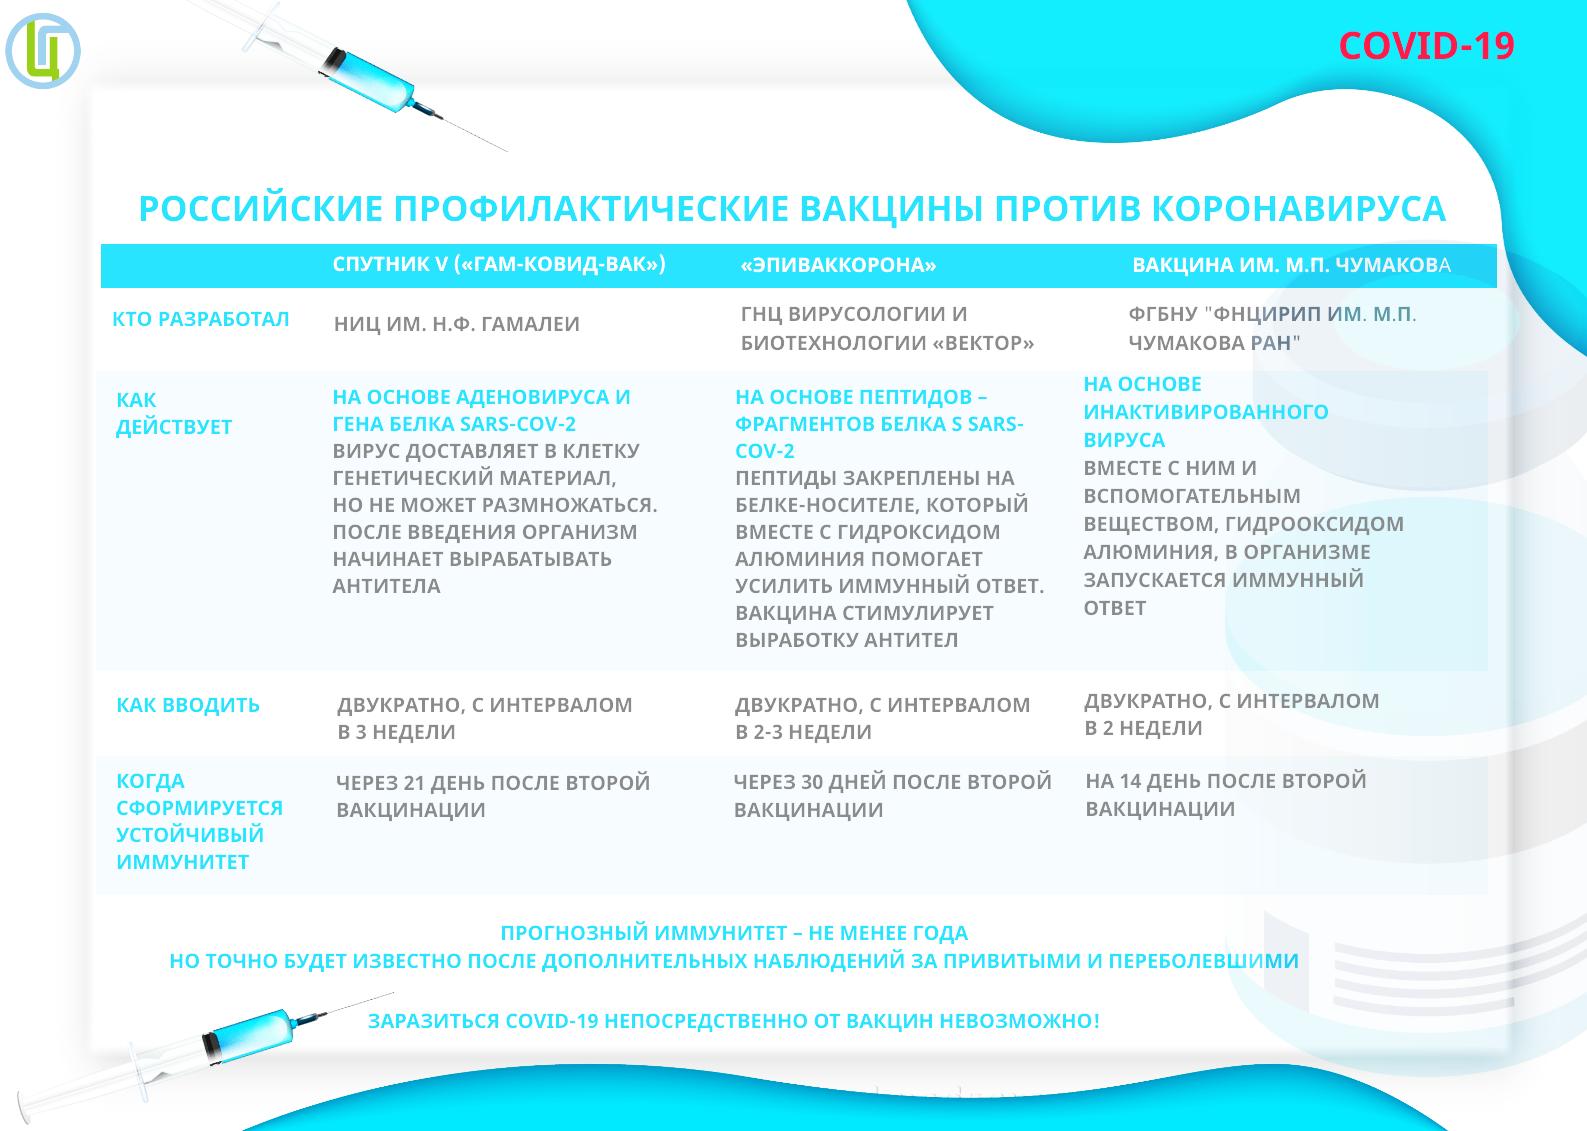 https://fbuz16.ru/repository/images/RFCovidVakciny301220.png